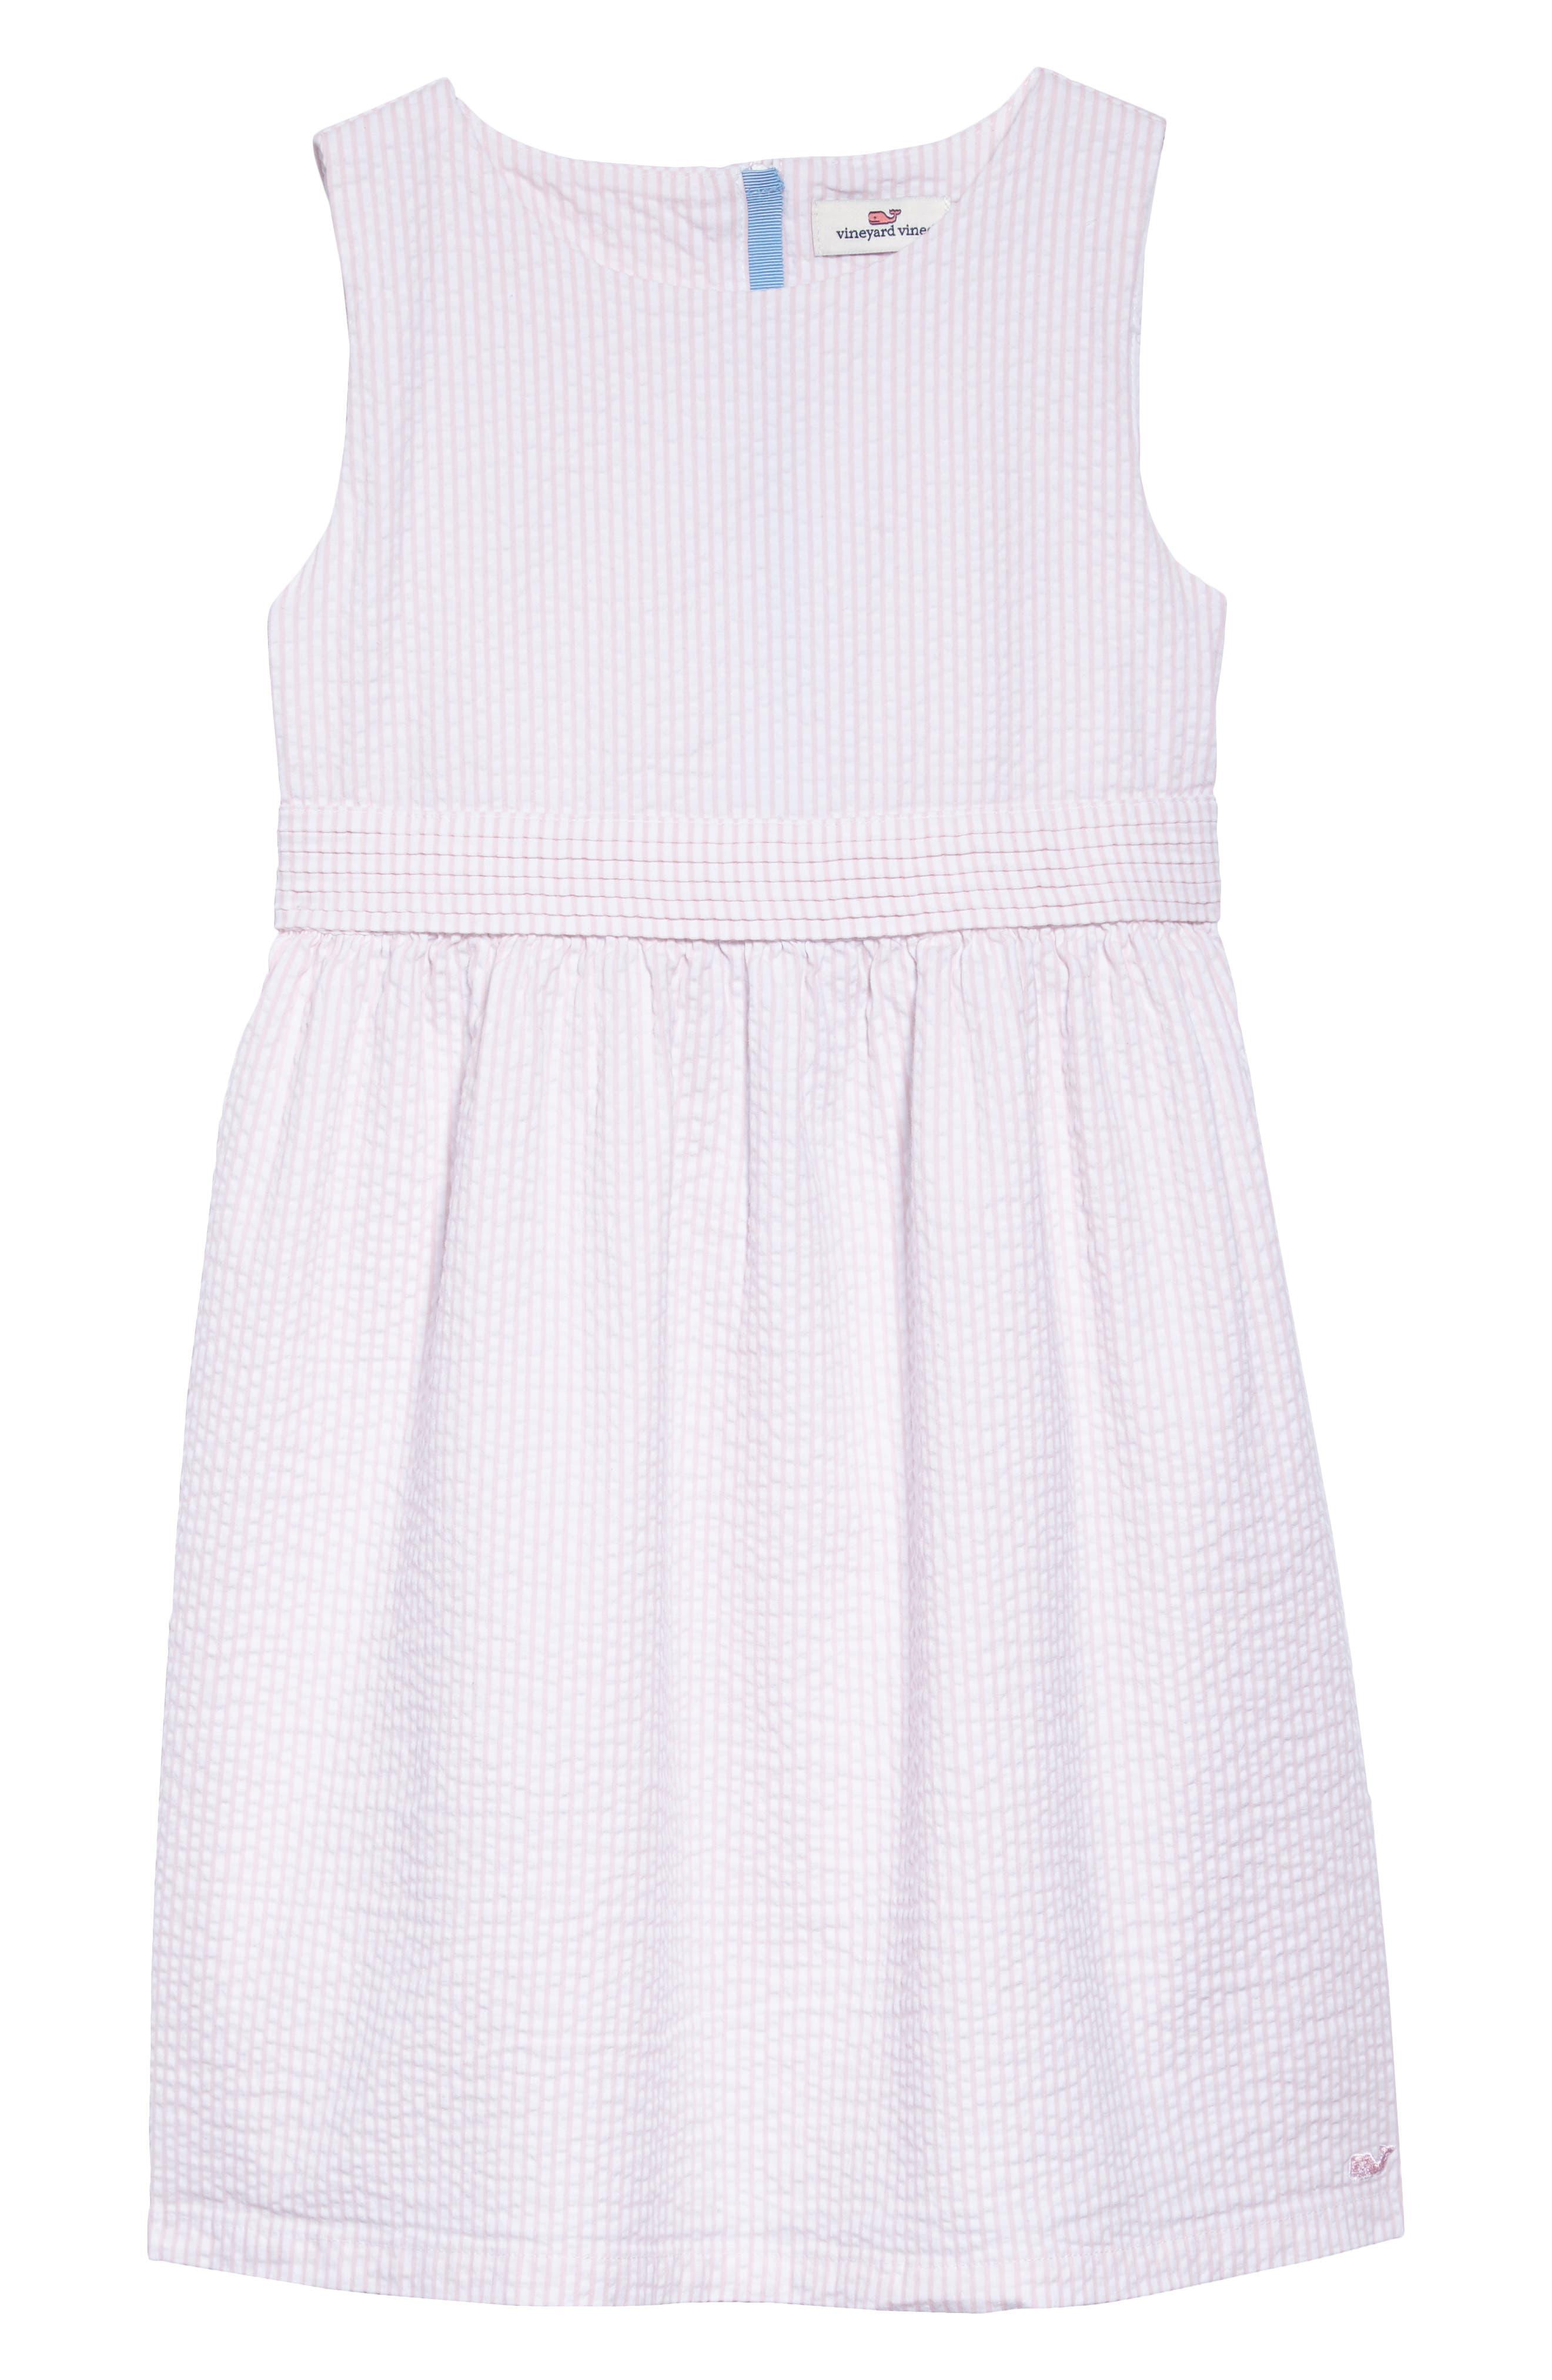 vineyard vines Seersucker Dress (Toddler Girls, Little Girls & Big Girls)